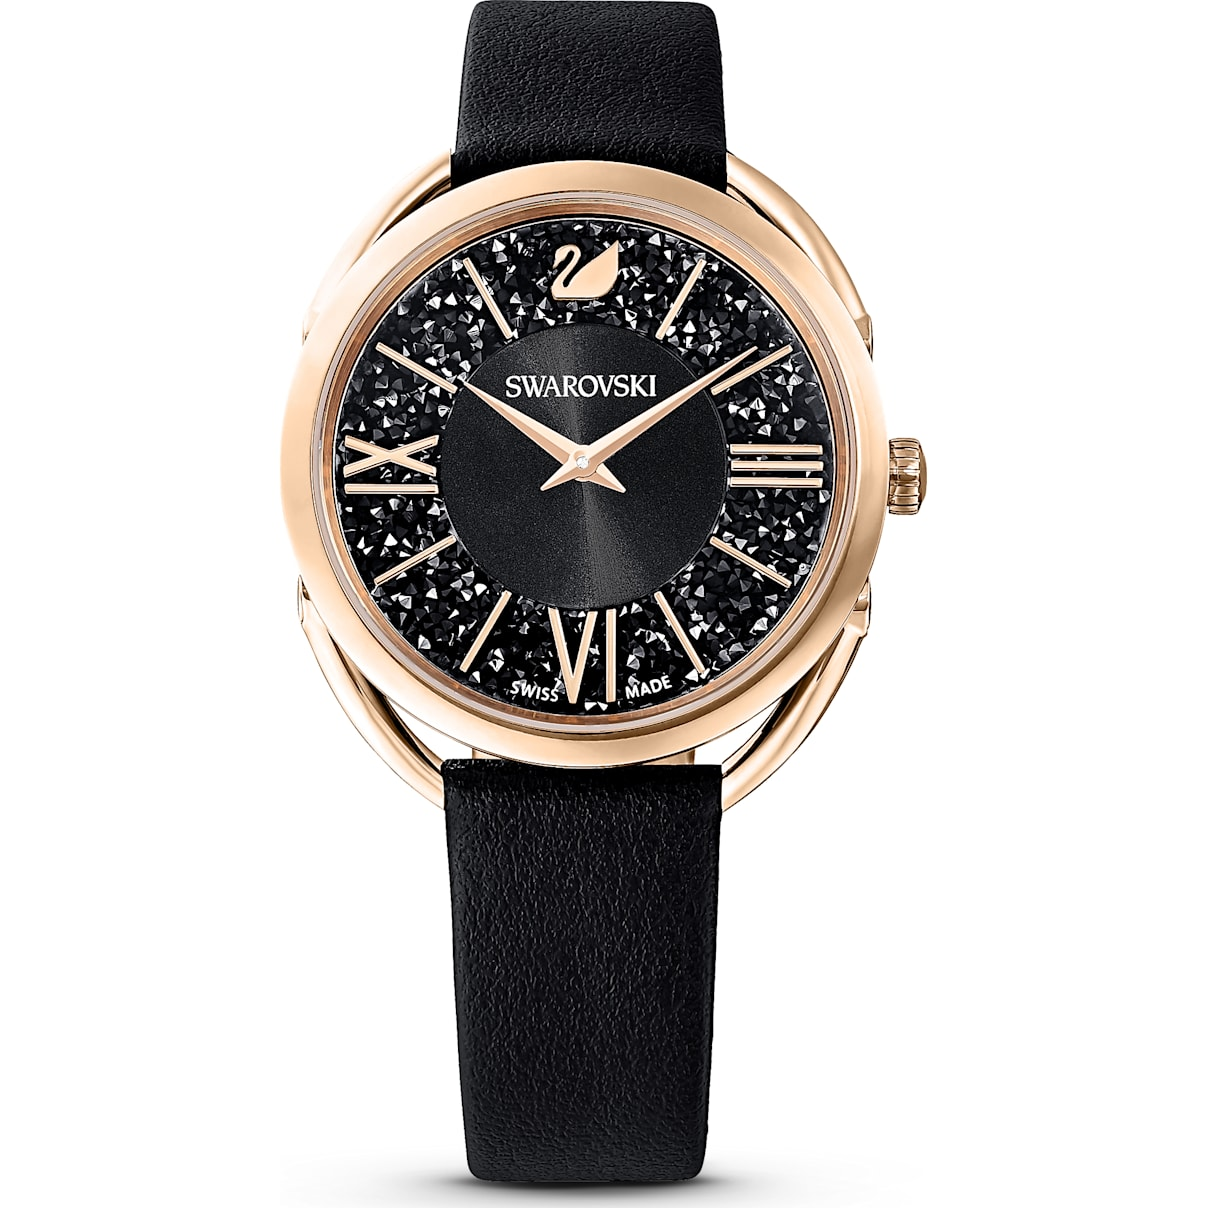 Swarovski Crystalline Glam Watch, Leather Strap, Black, Rose-gold tone PVD